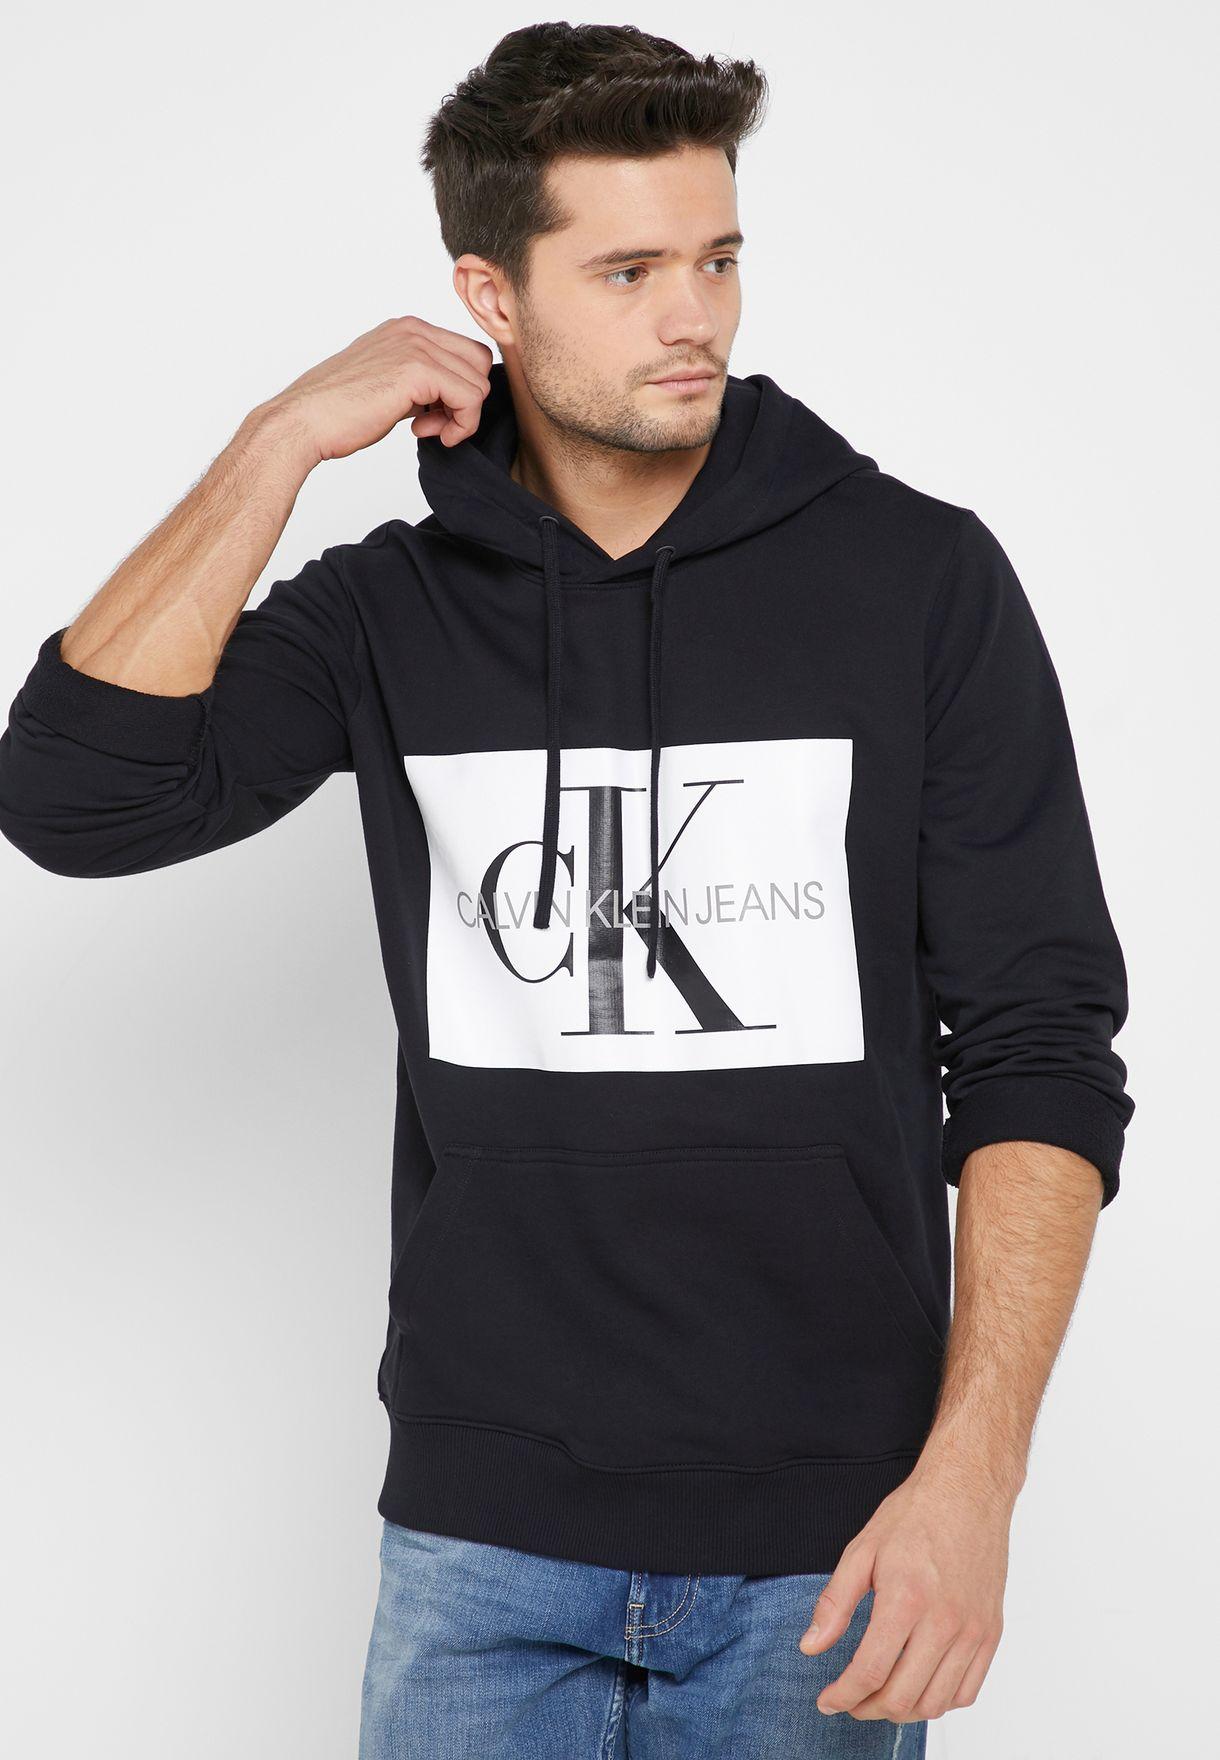 c5594410d413 Shop Calvin Klein Jeans black Monogram Logo Box Hoodie J30J307745 ...